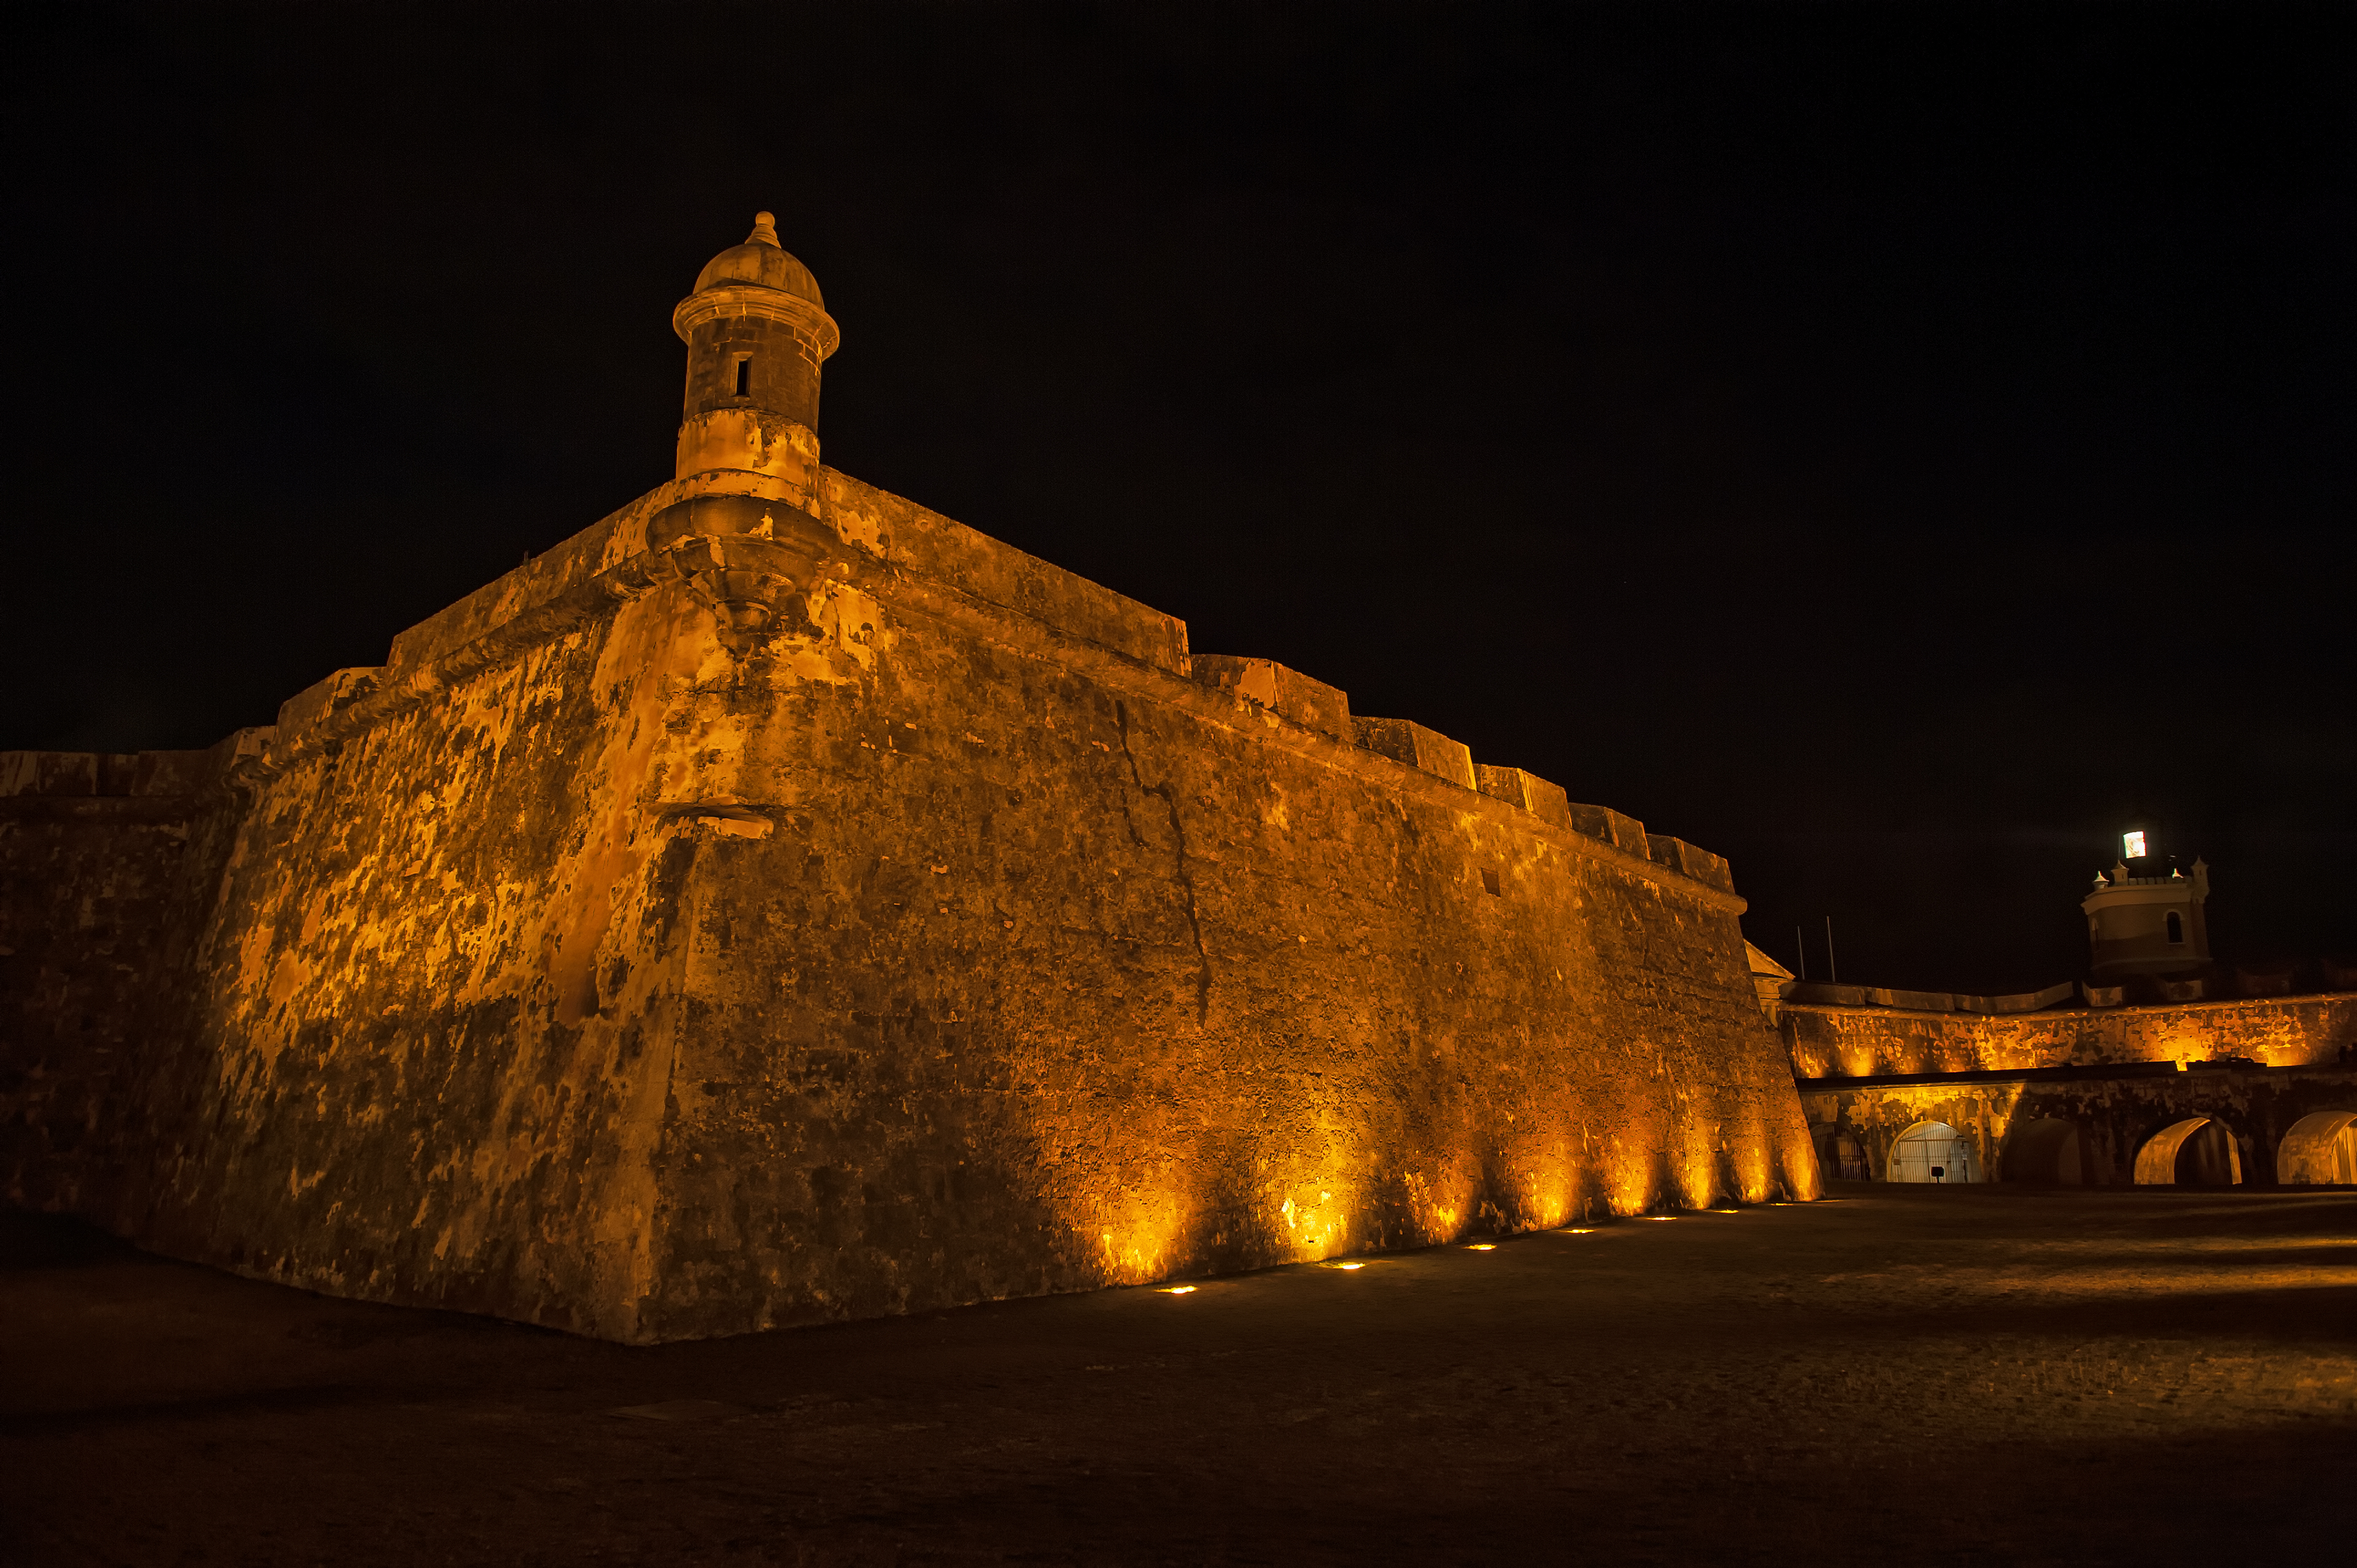 El Morro at night